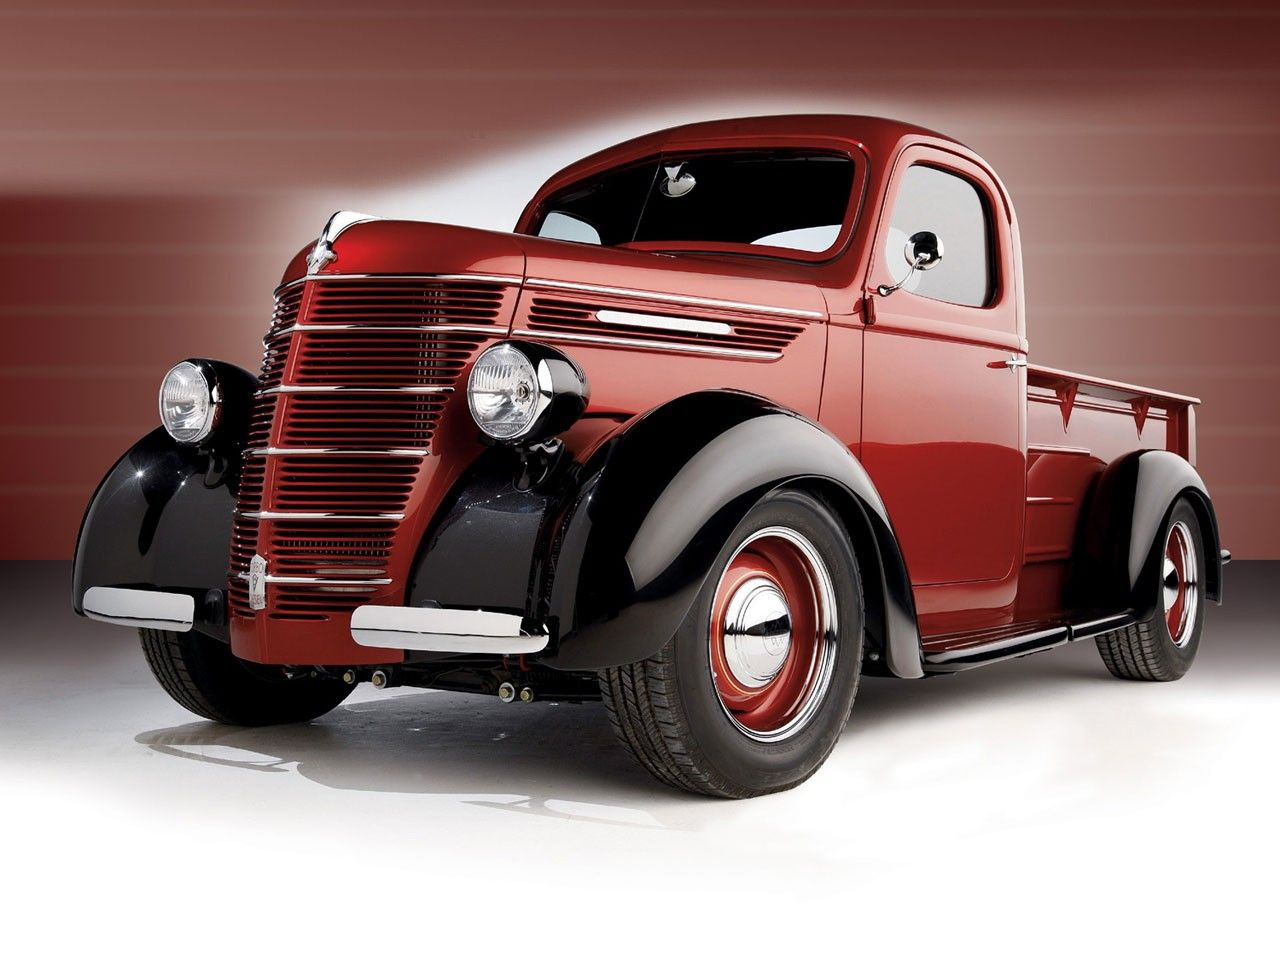 1939 International D Series Pickup Desktop Wallpaper 1280x960 Classic Cars Trucks Pickup Trucks Classic Pickup Trucks